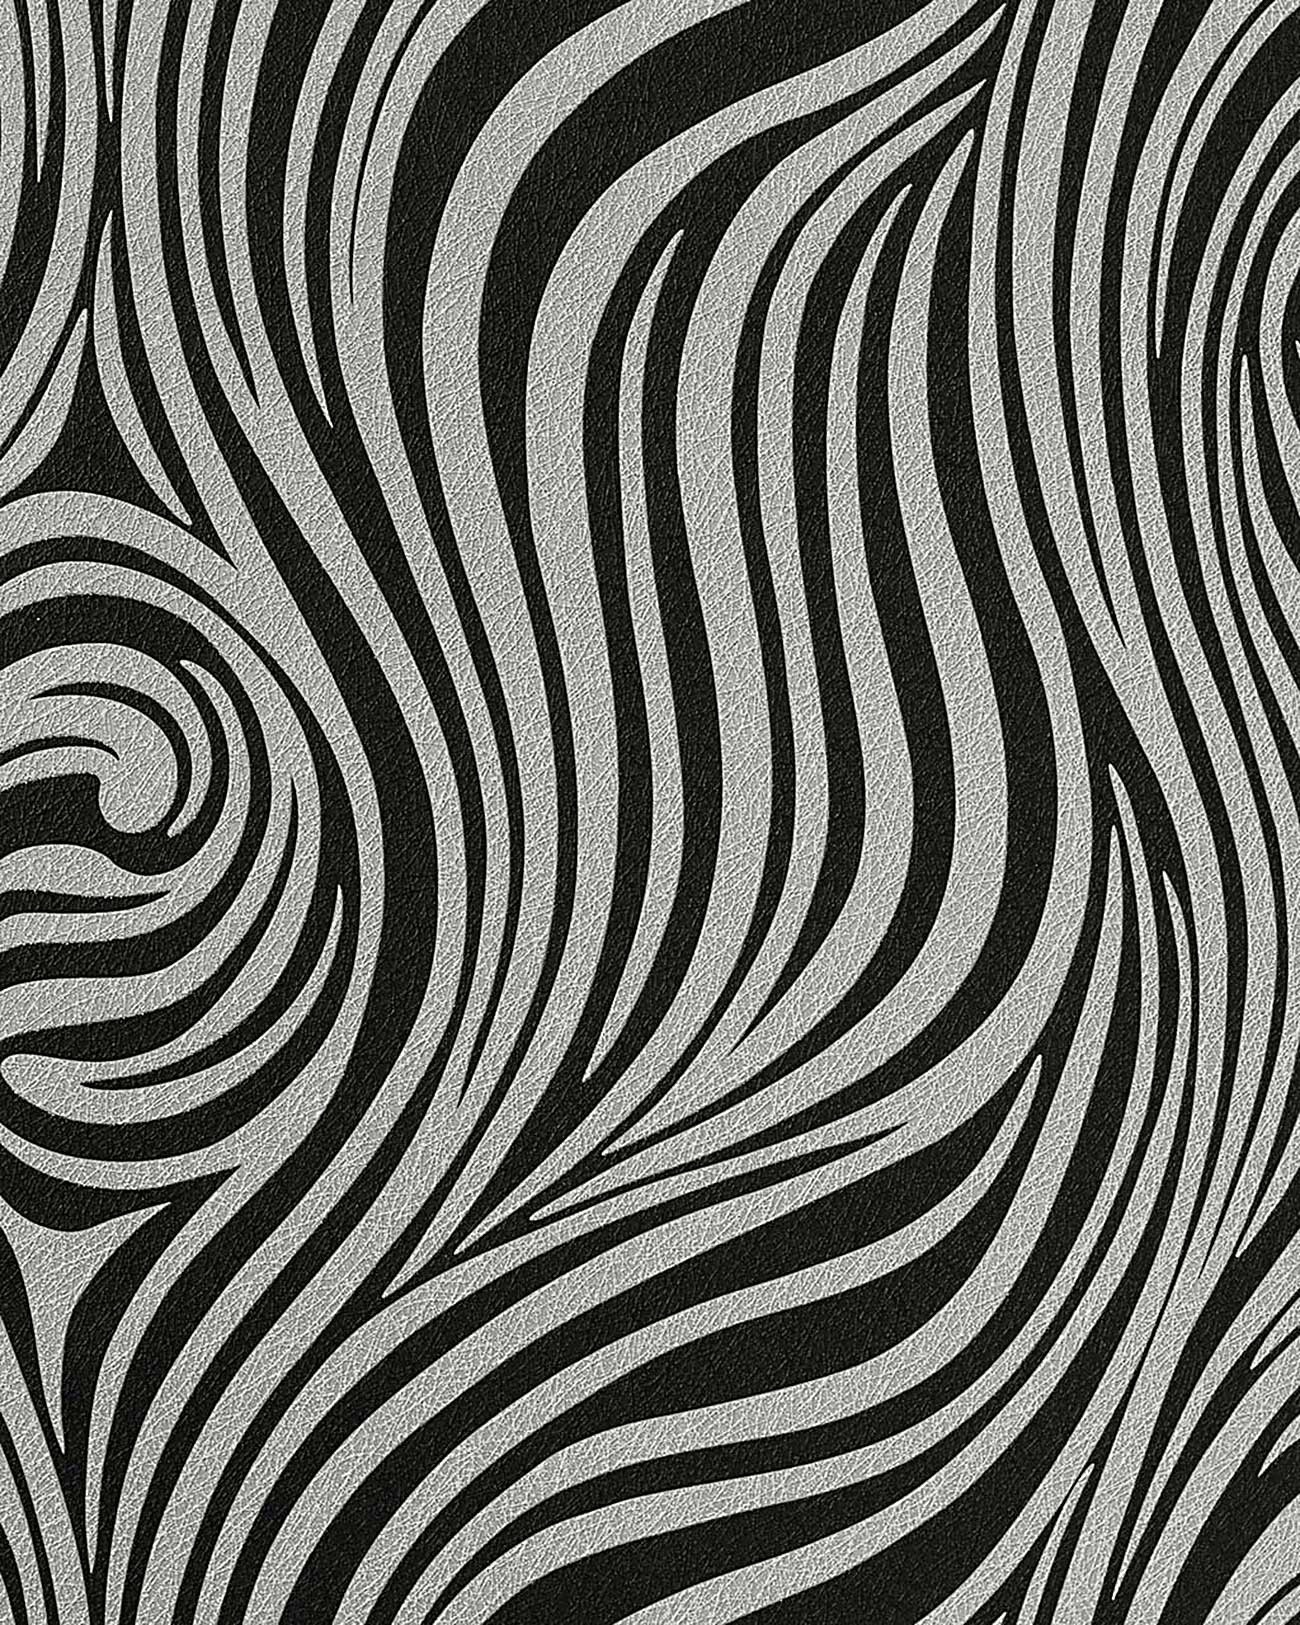 Zebra Patterned Wallpaper - Fashion zebra style wallcovering wall wallpaper edem 1016 16 texture striped vinyl extra washable black silver grey